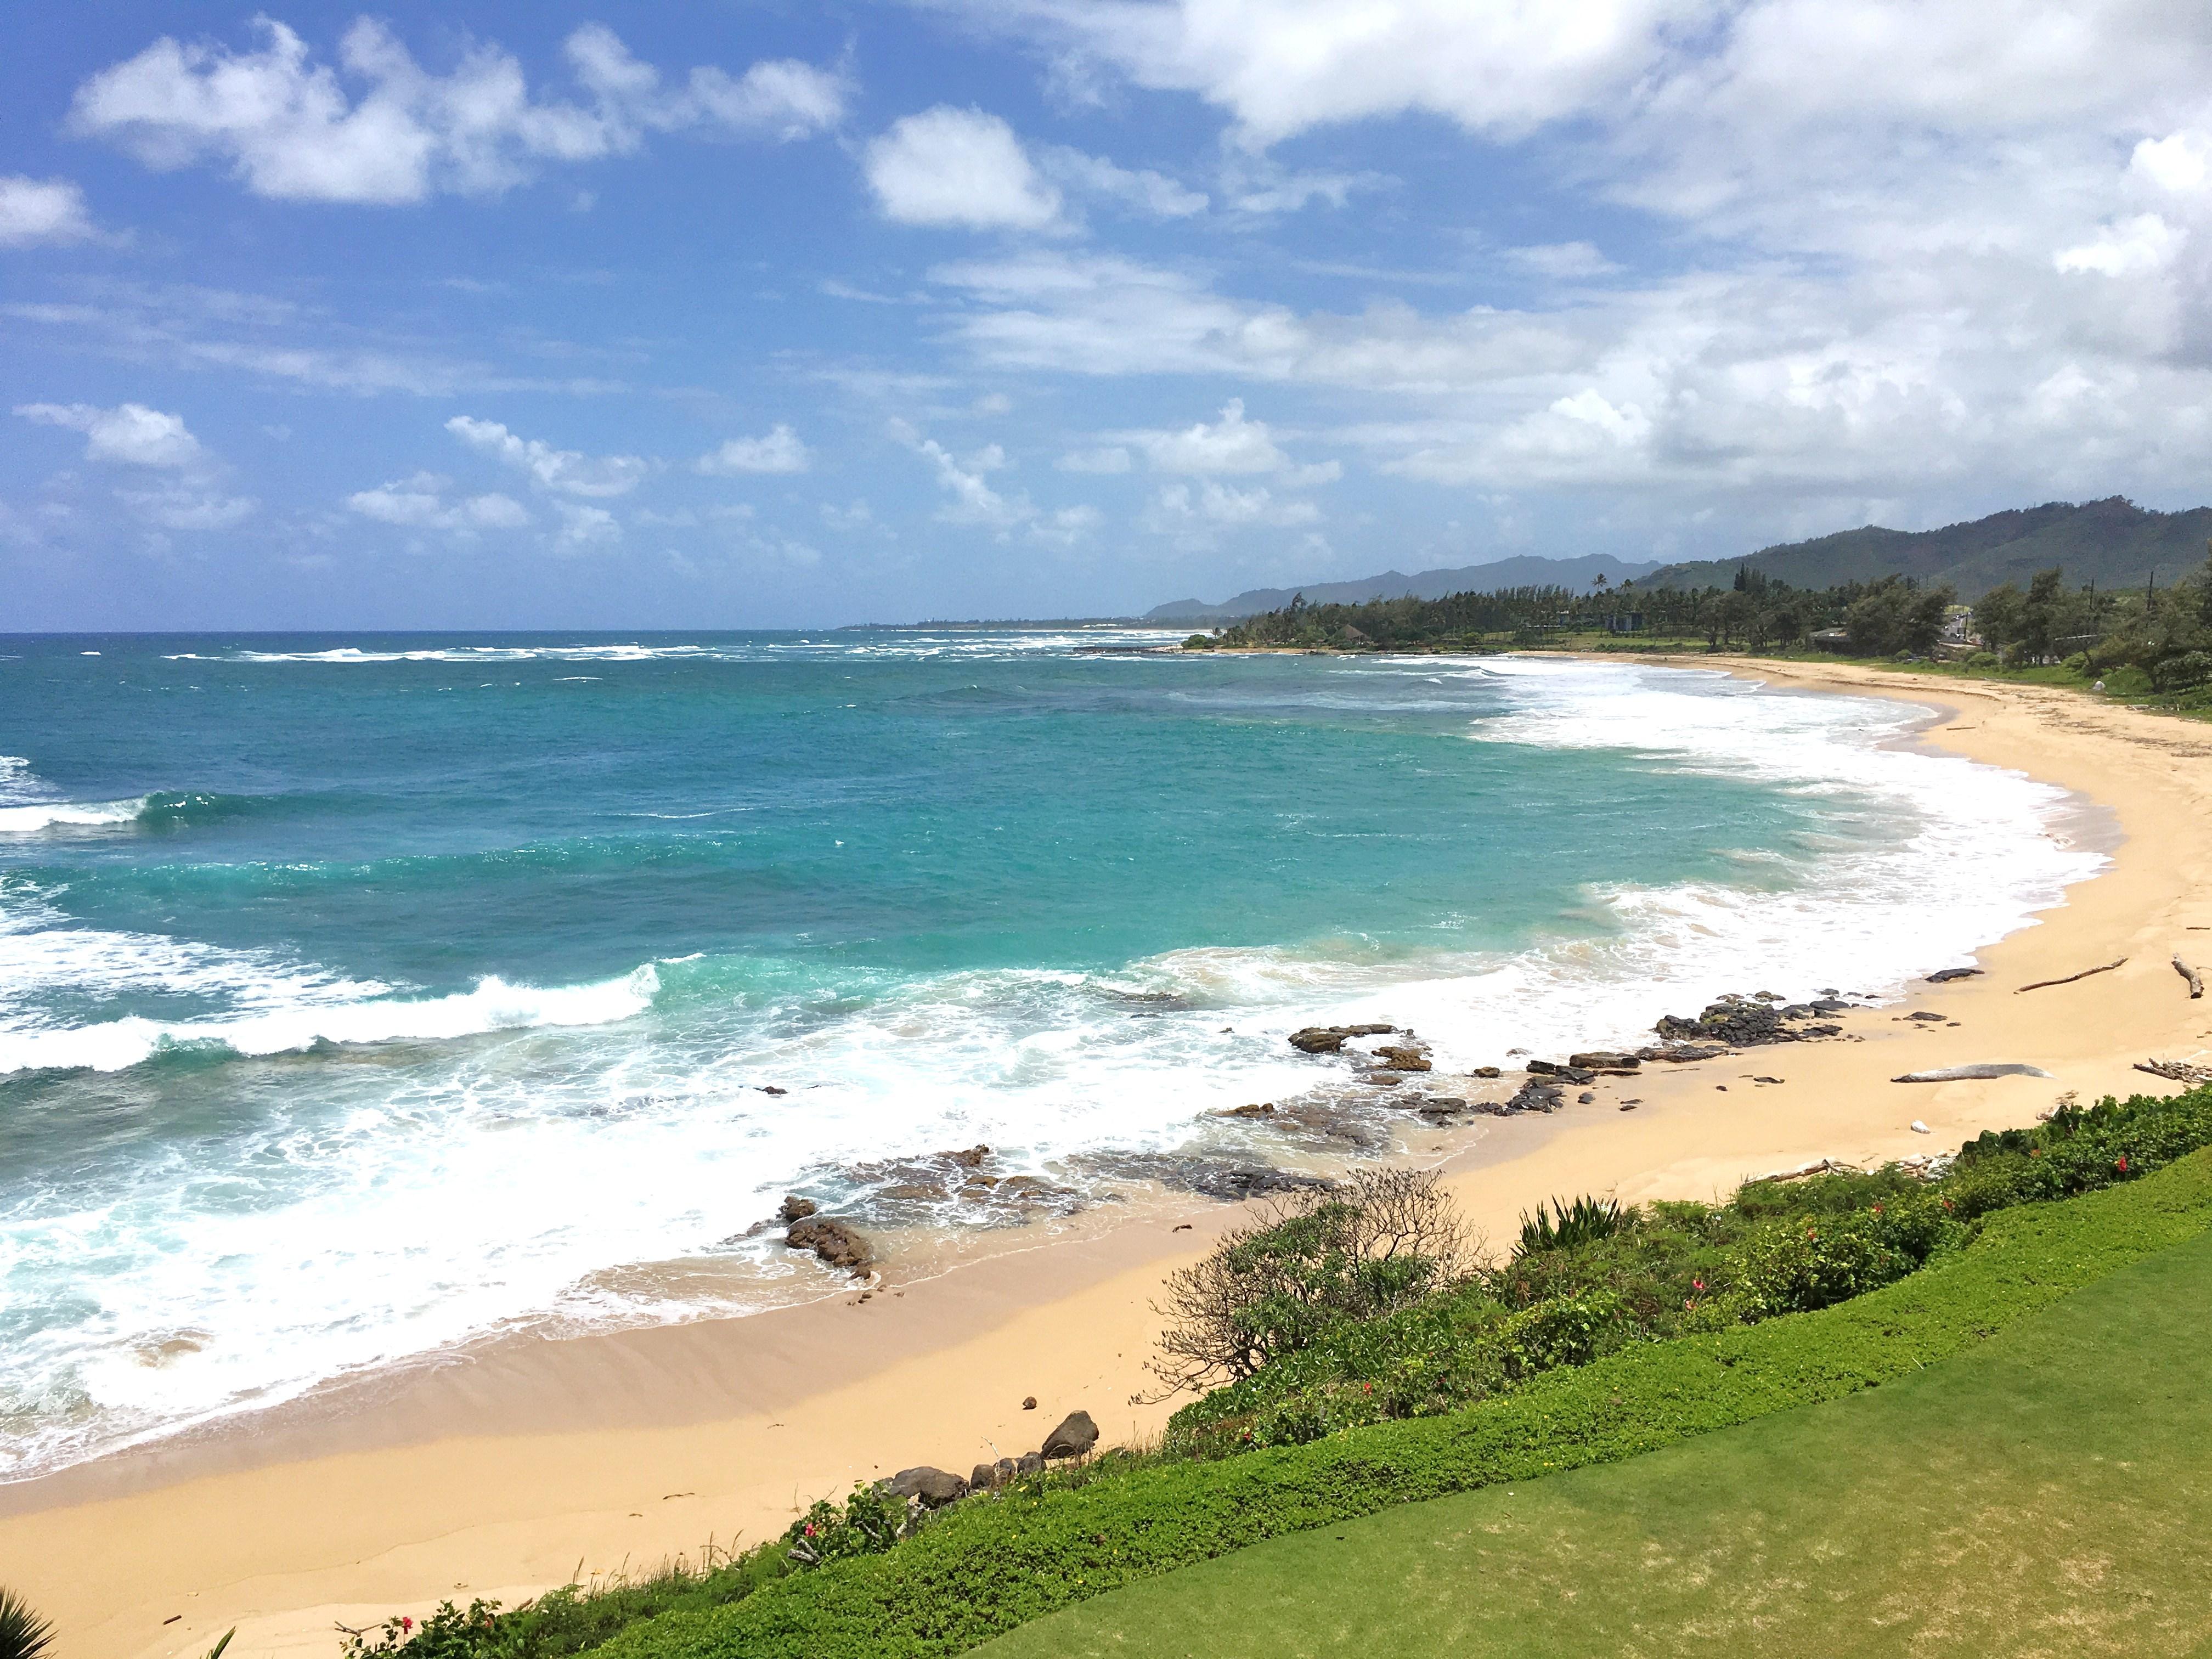 Kauai surfing beach Wailua Bay